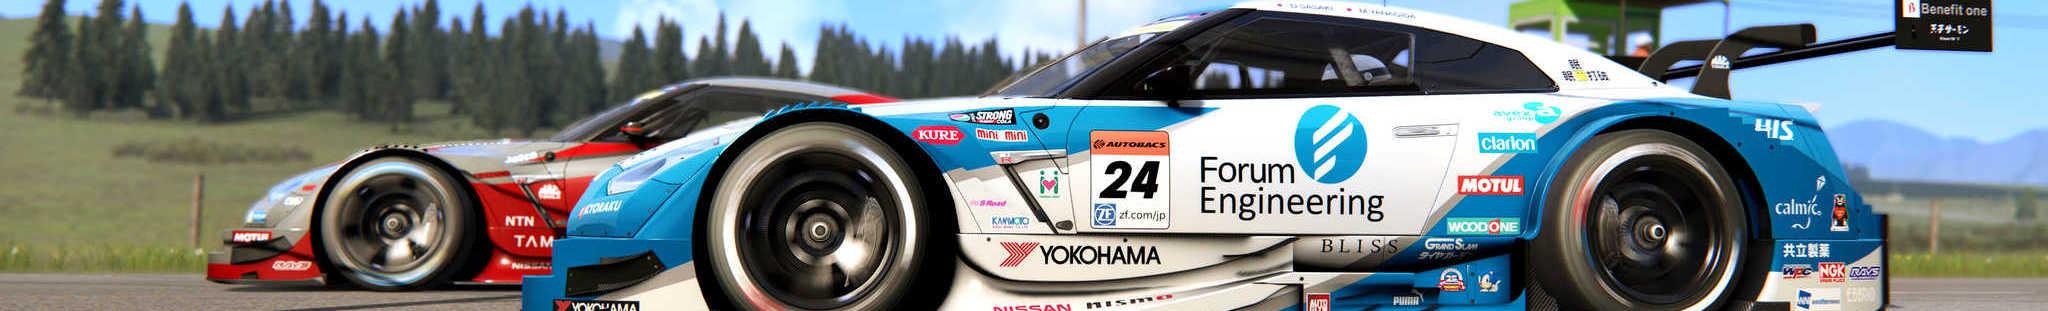 RacingRoad banner